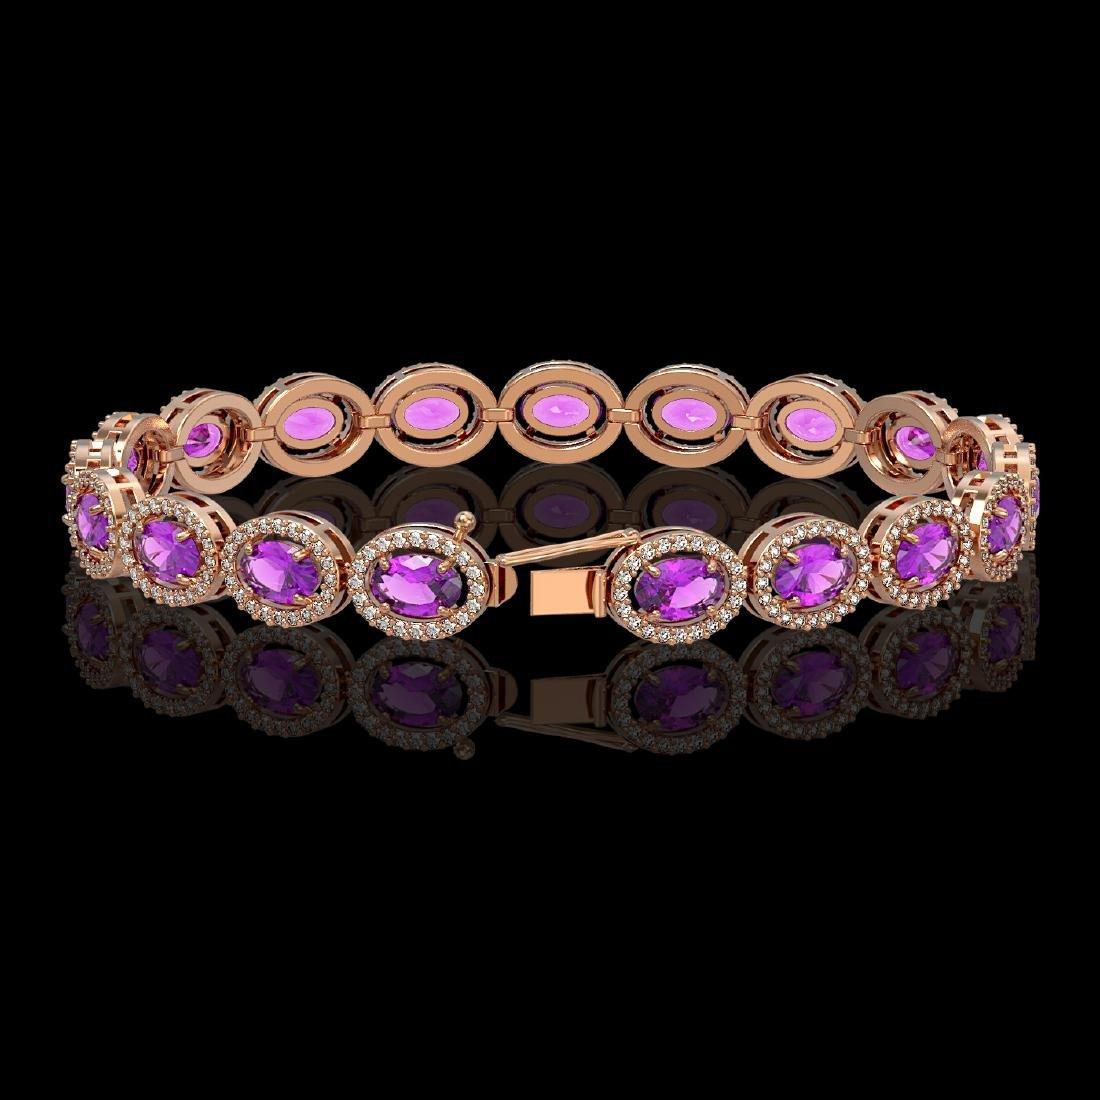 13.11 CTW Amethyst & Diamond Halo Bracelet 10K Rose - 2